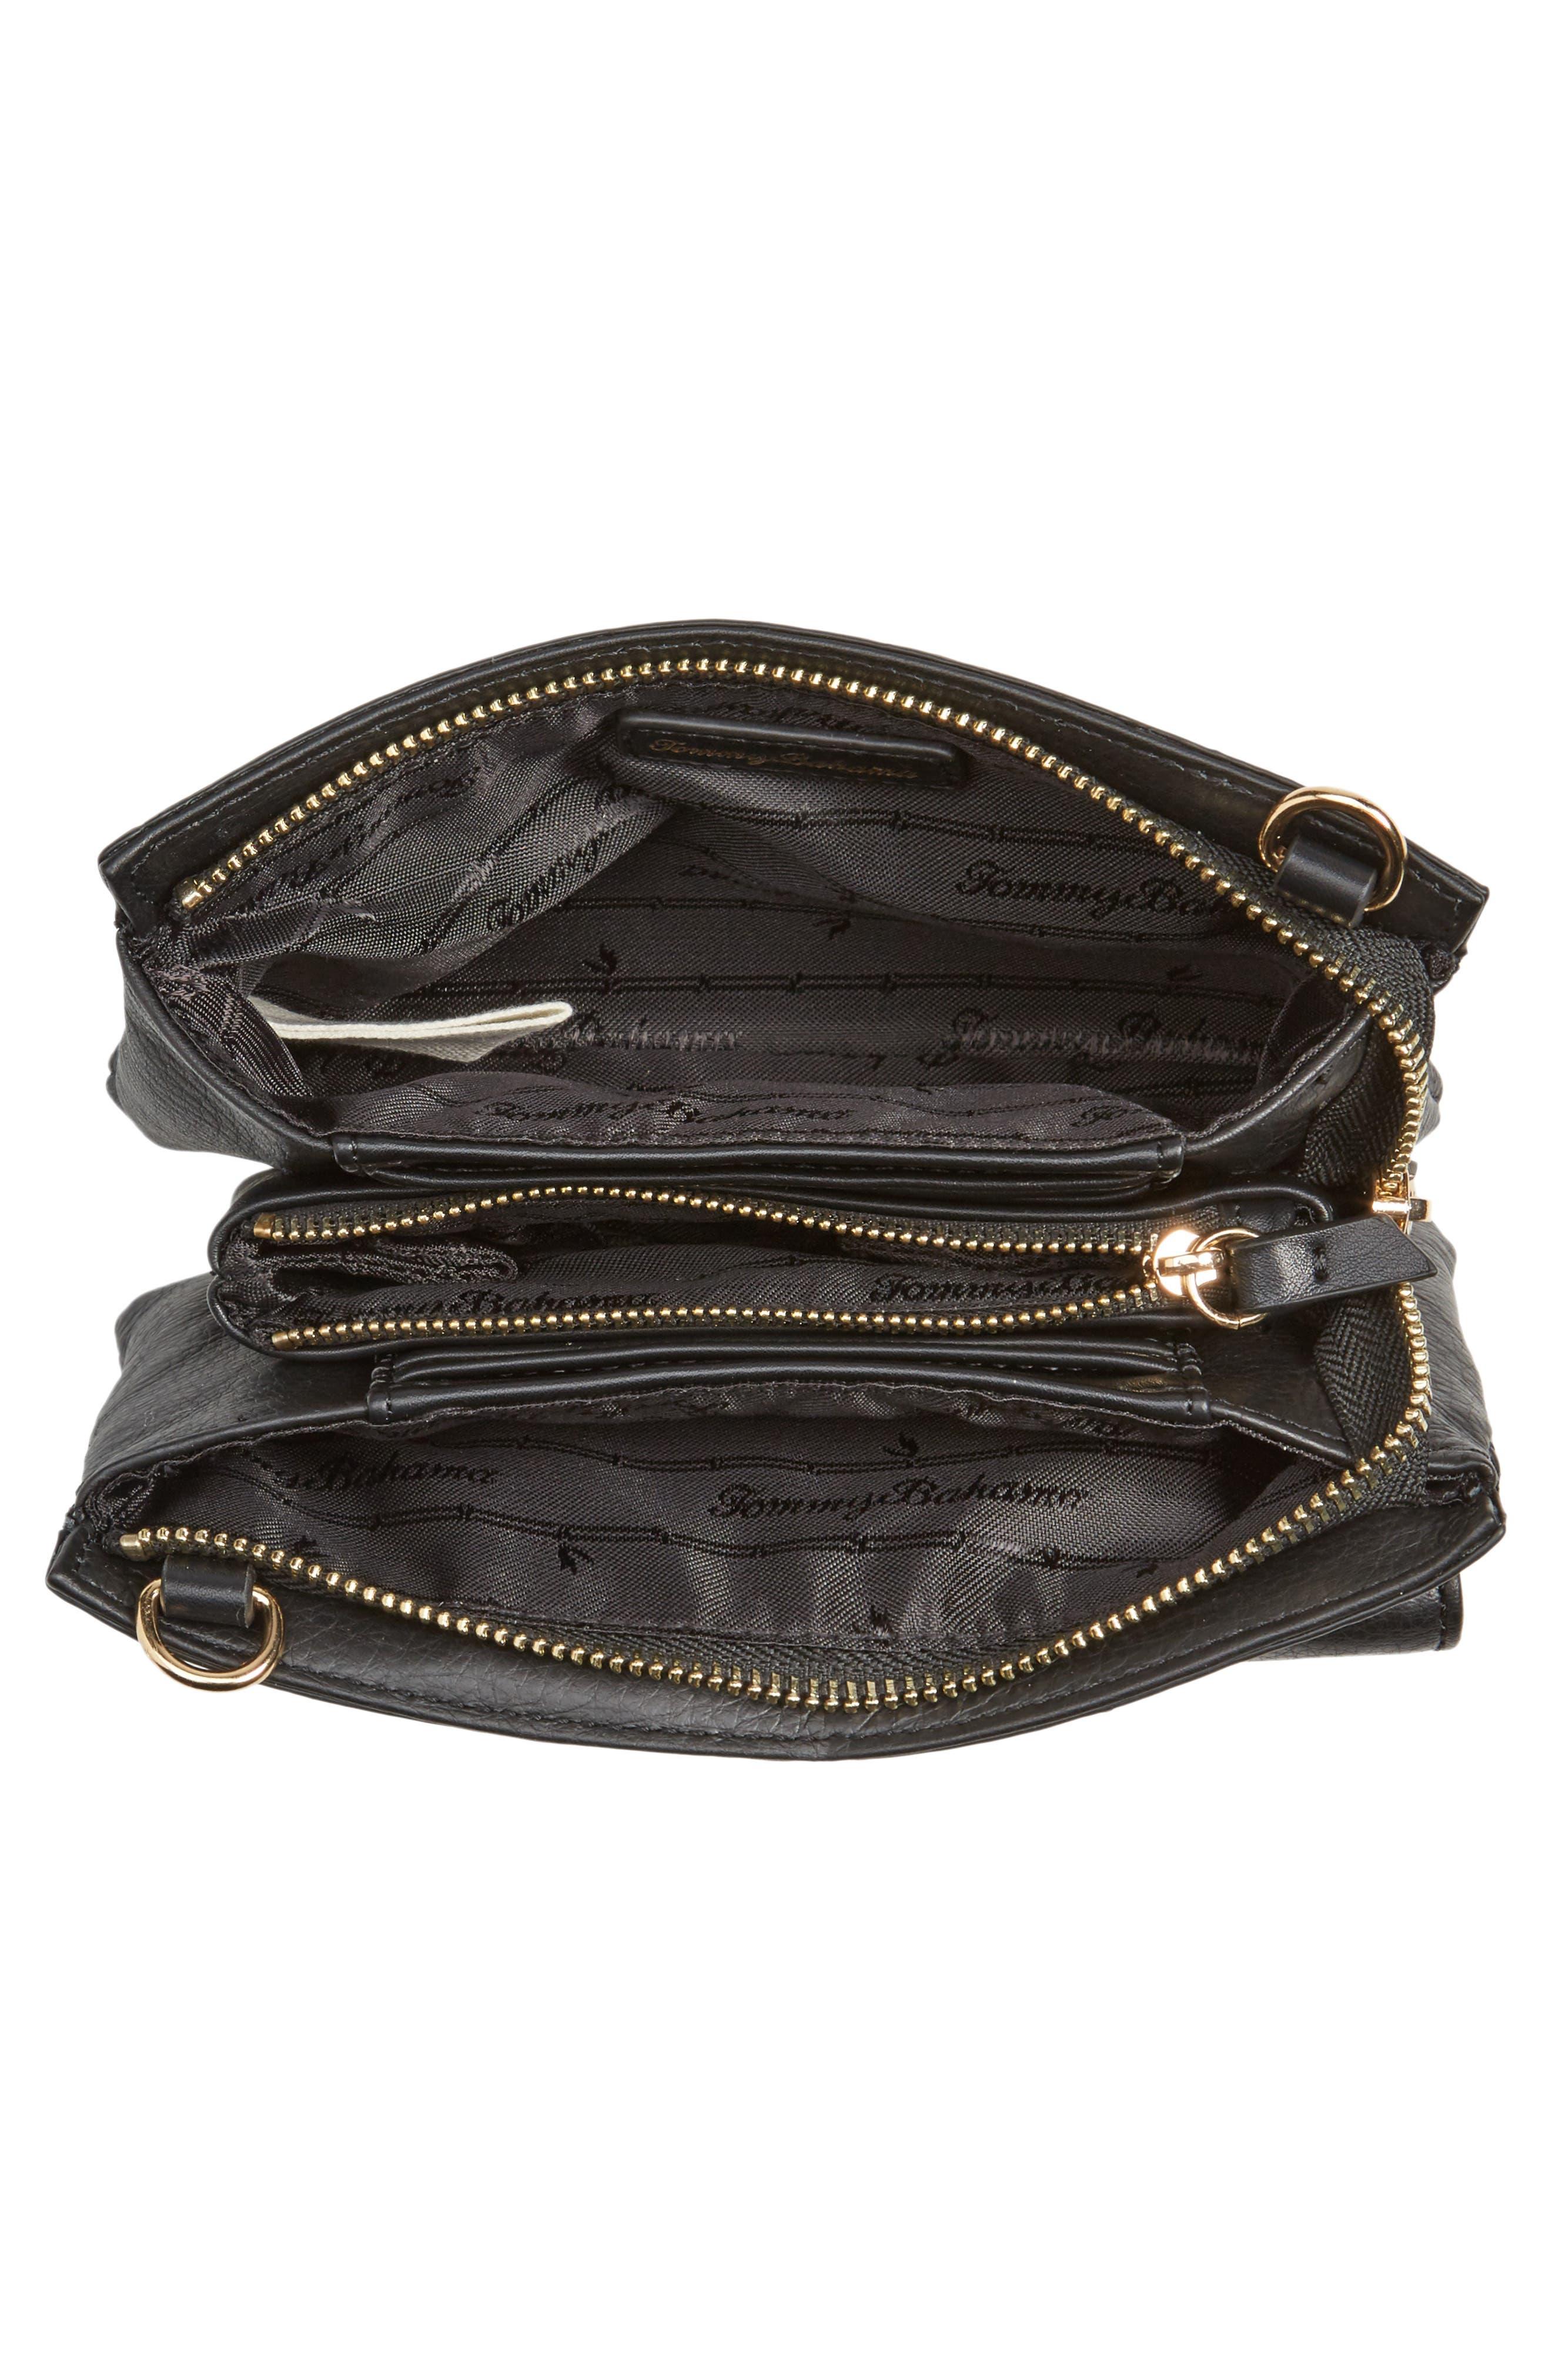 Katerini Leather Crossbody Wallet,                             Alternate thumbnail 21, color,